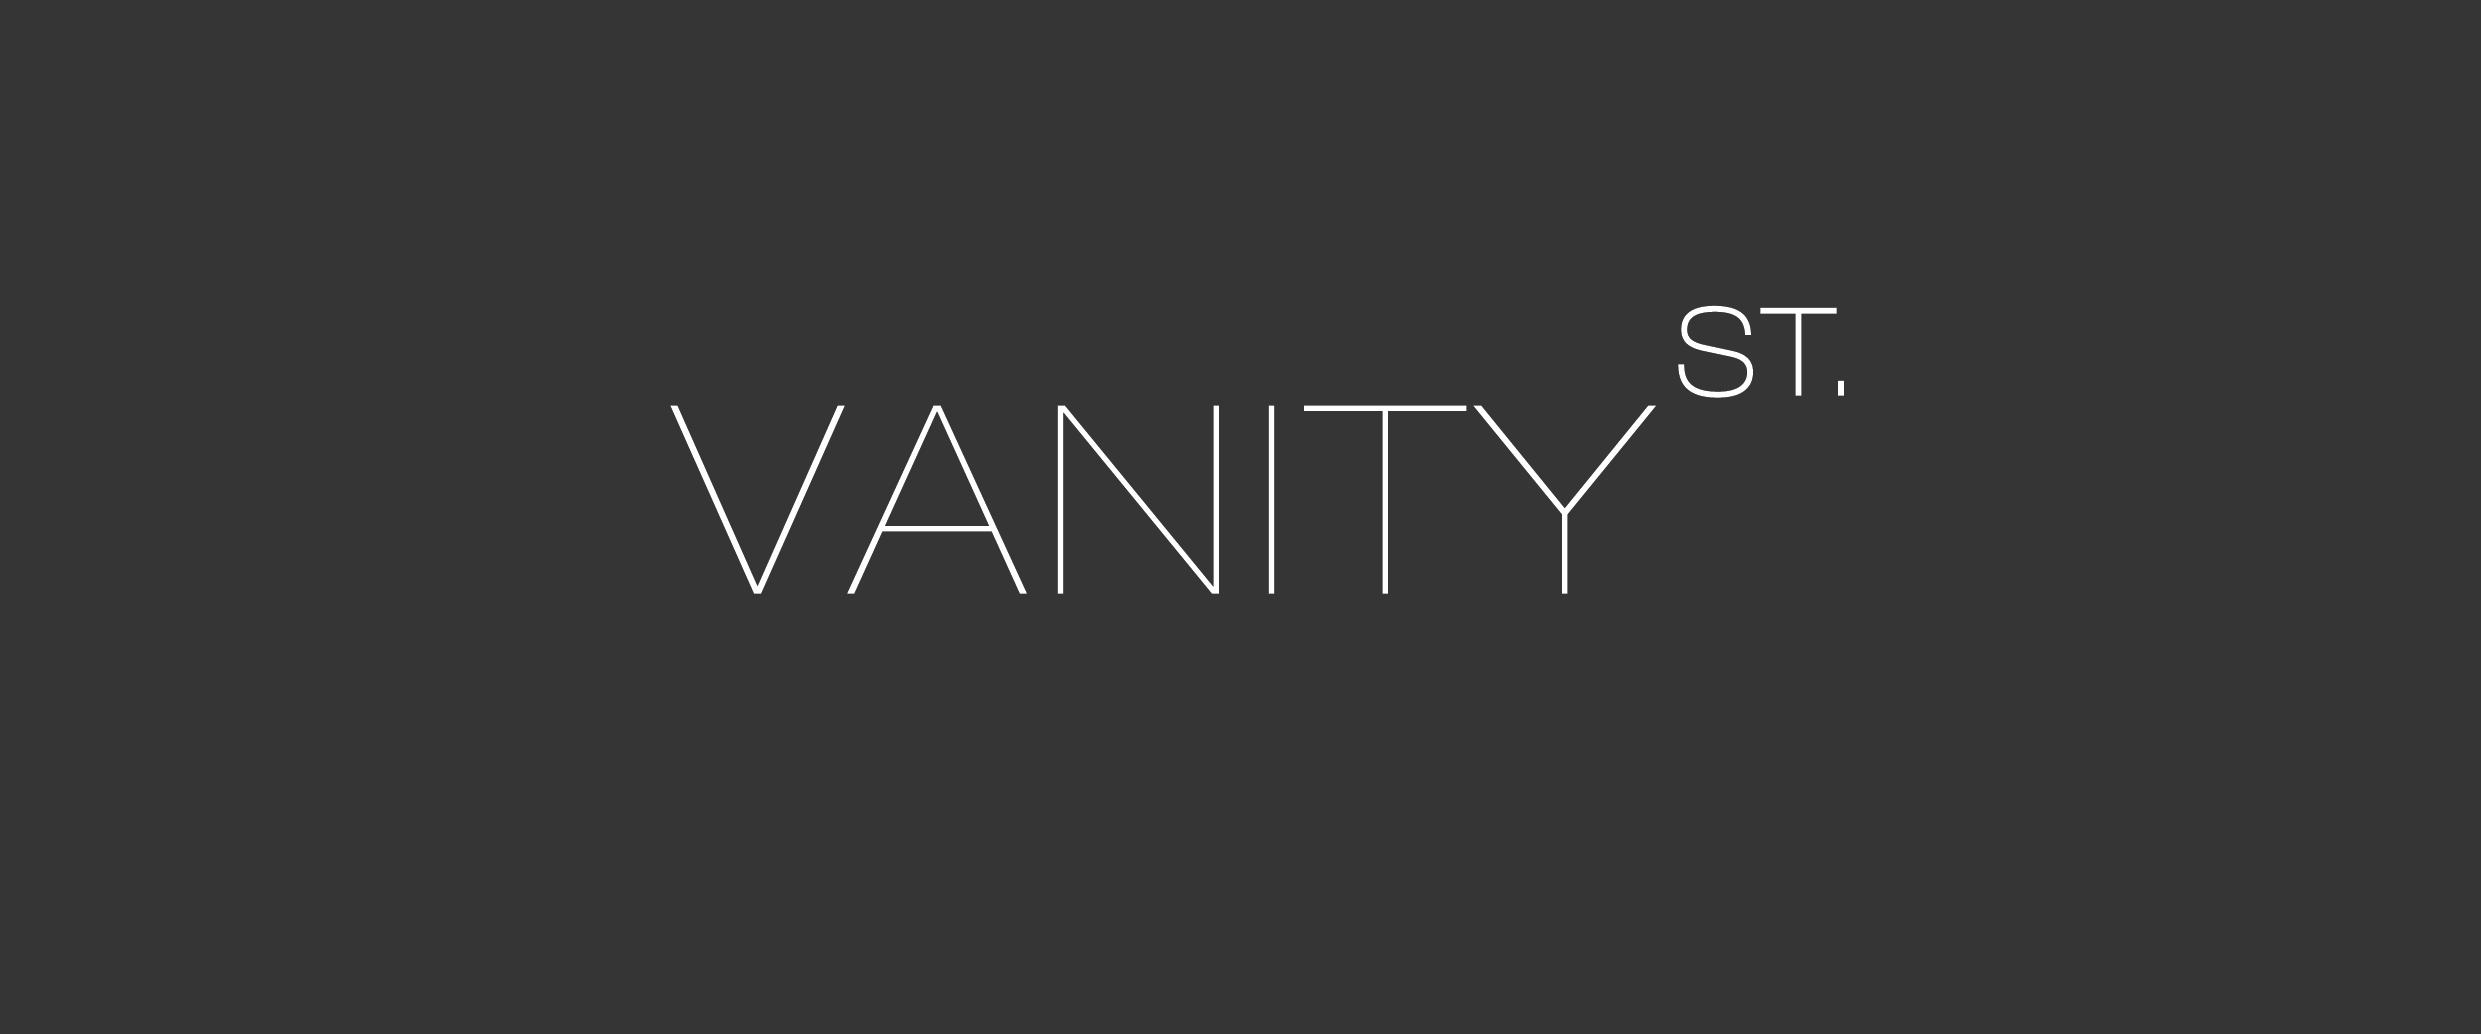 Design a new logo for Vanity St.